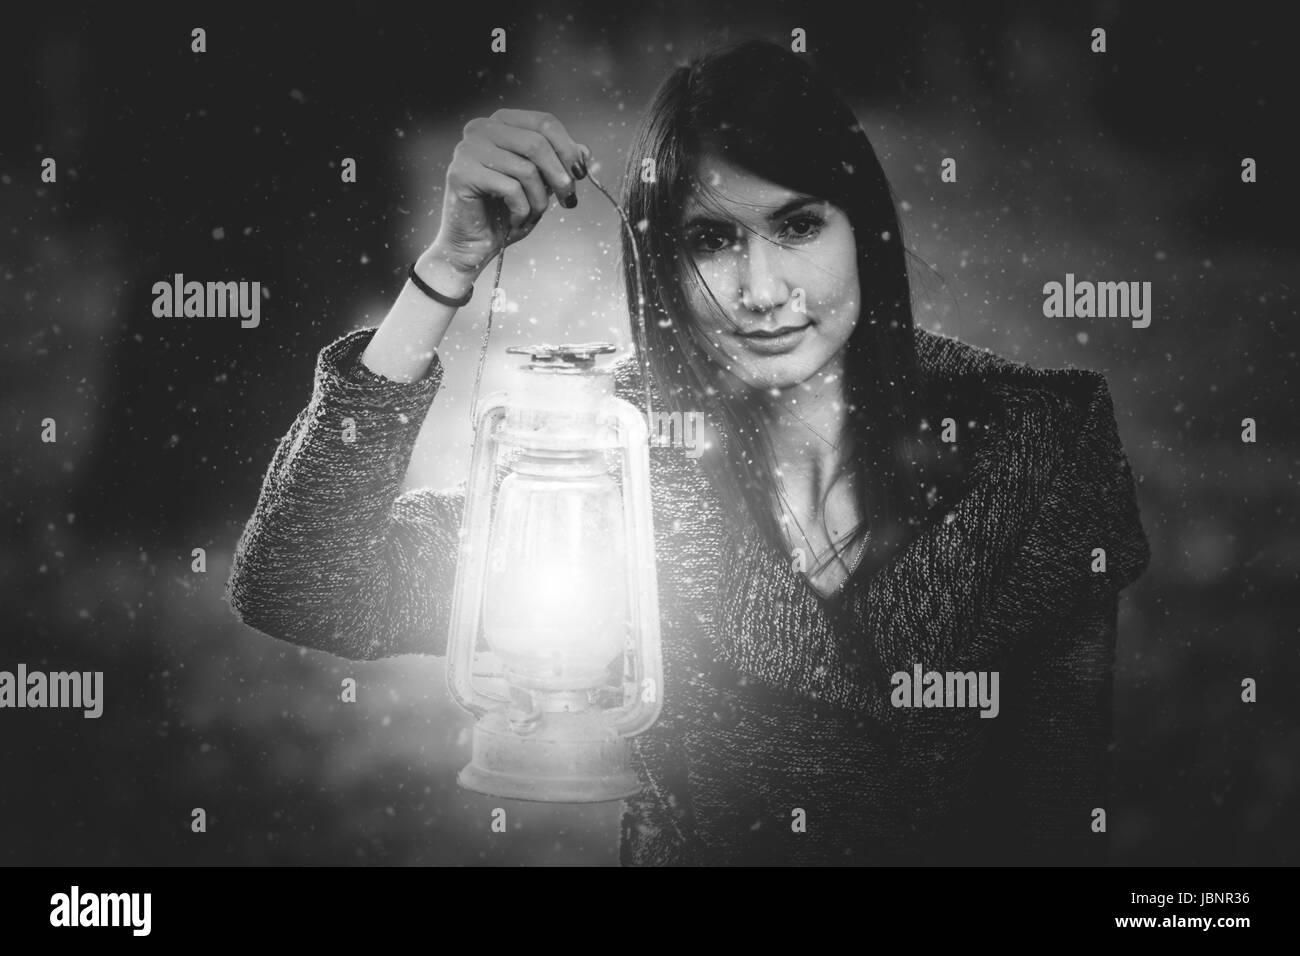 Femme avec lanterne en forêt d'hiver Banque D'Images